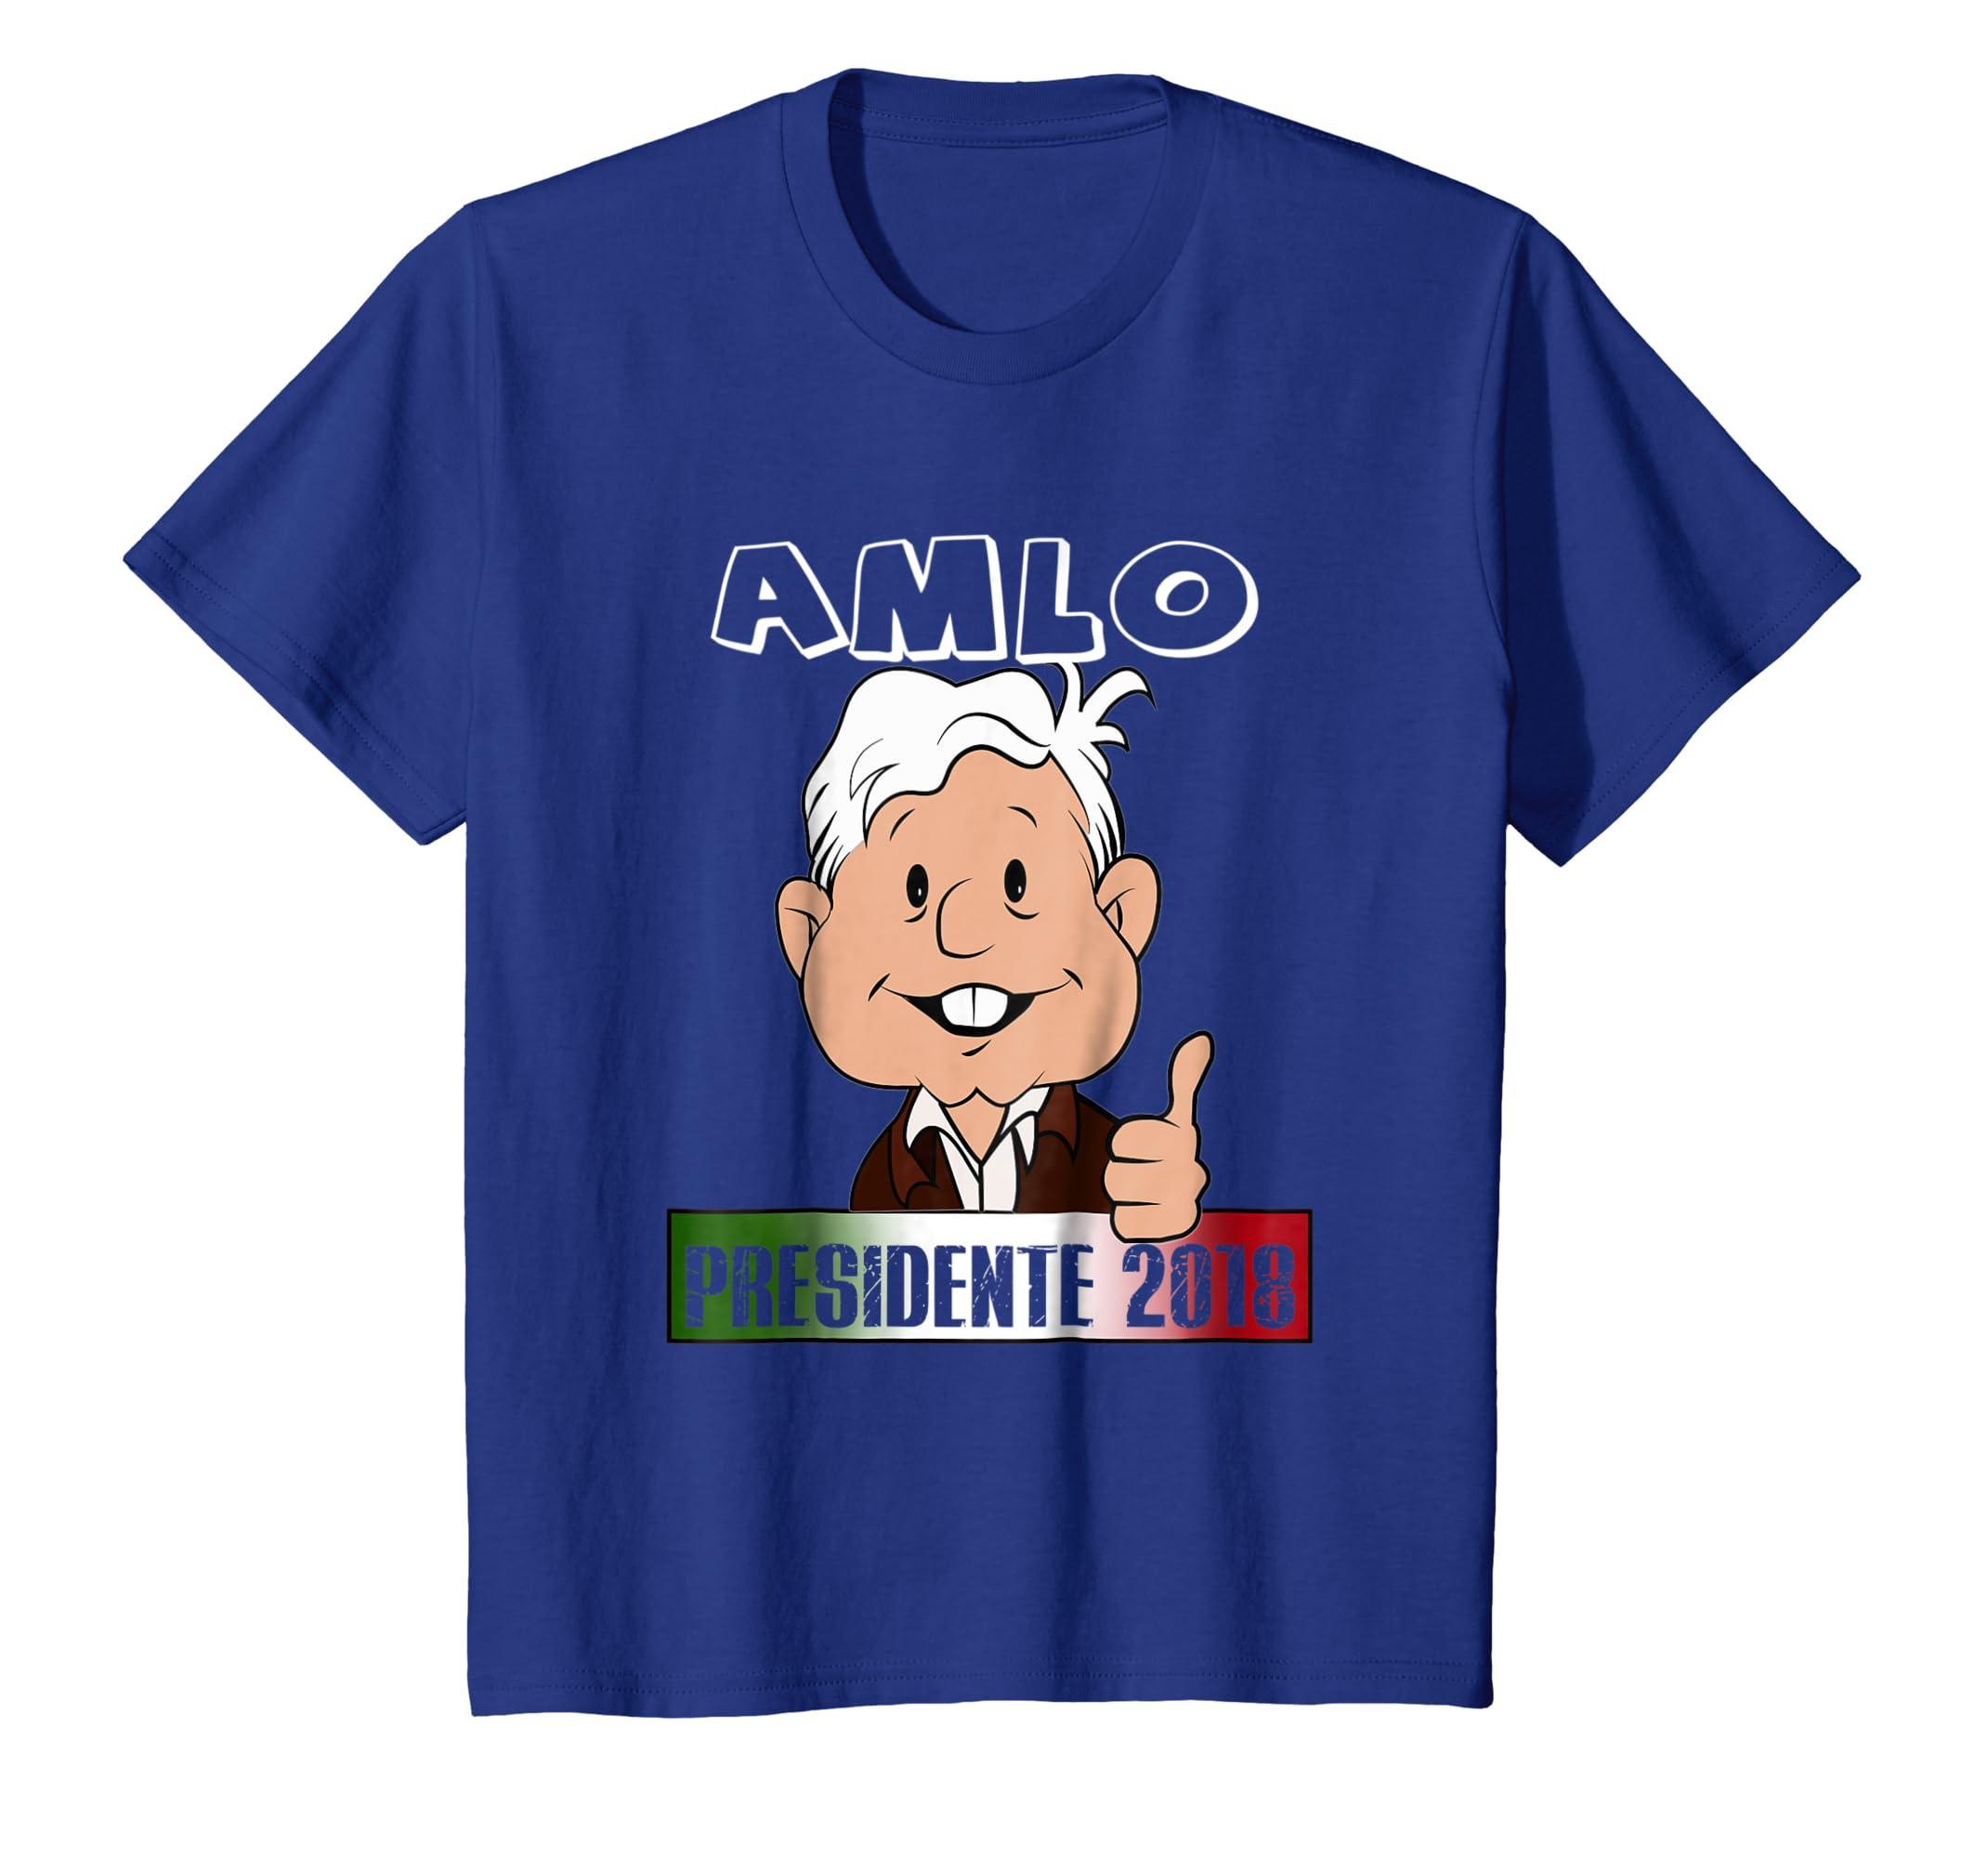 Amazon.com: AMLO Presidente 2018 Shirt Elecciones Mexico Camisa Espanol: Clothing